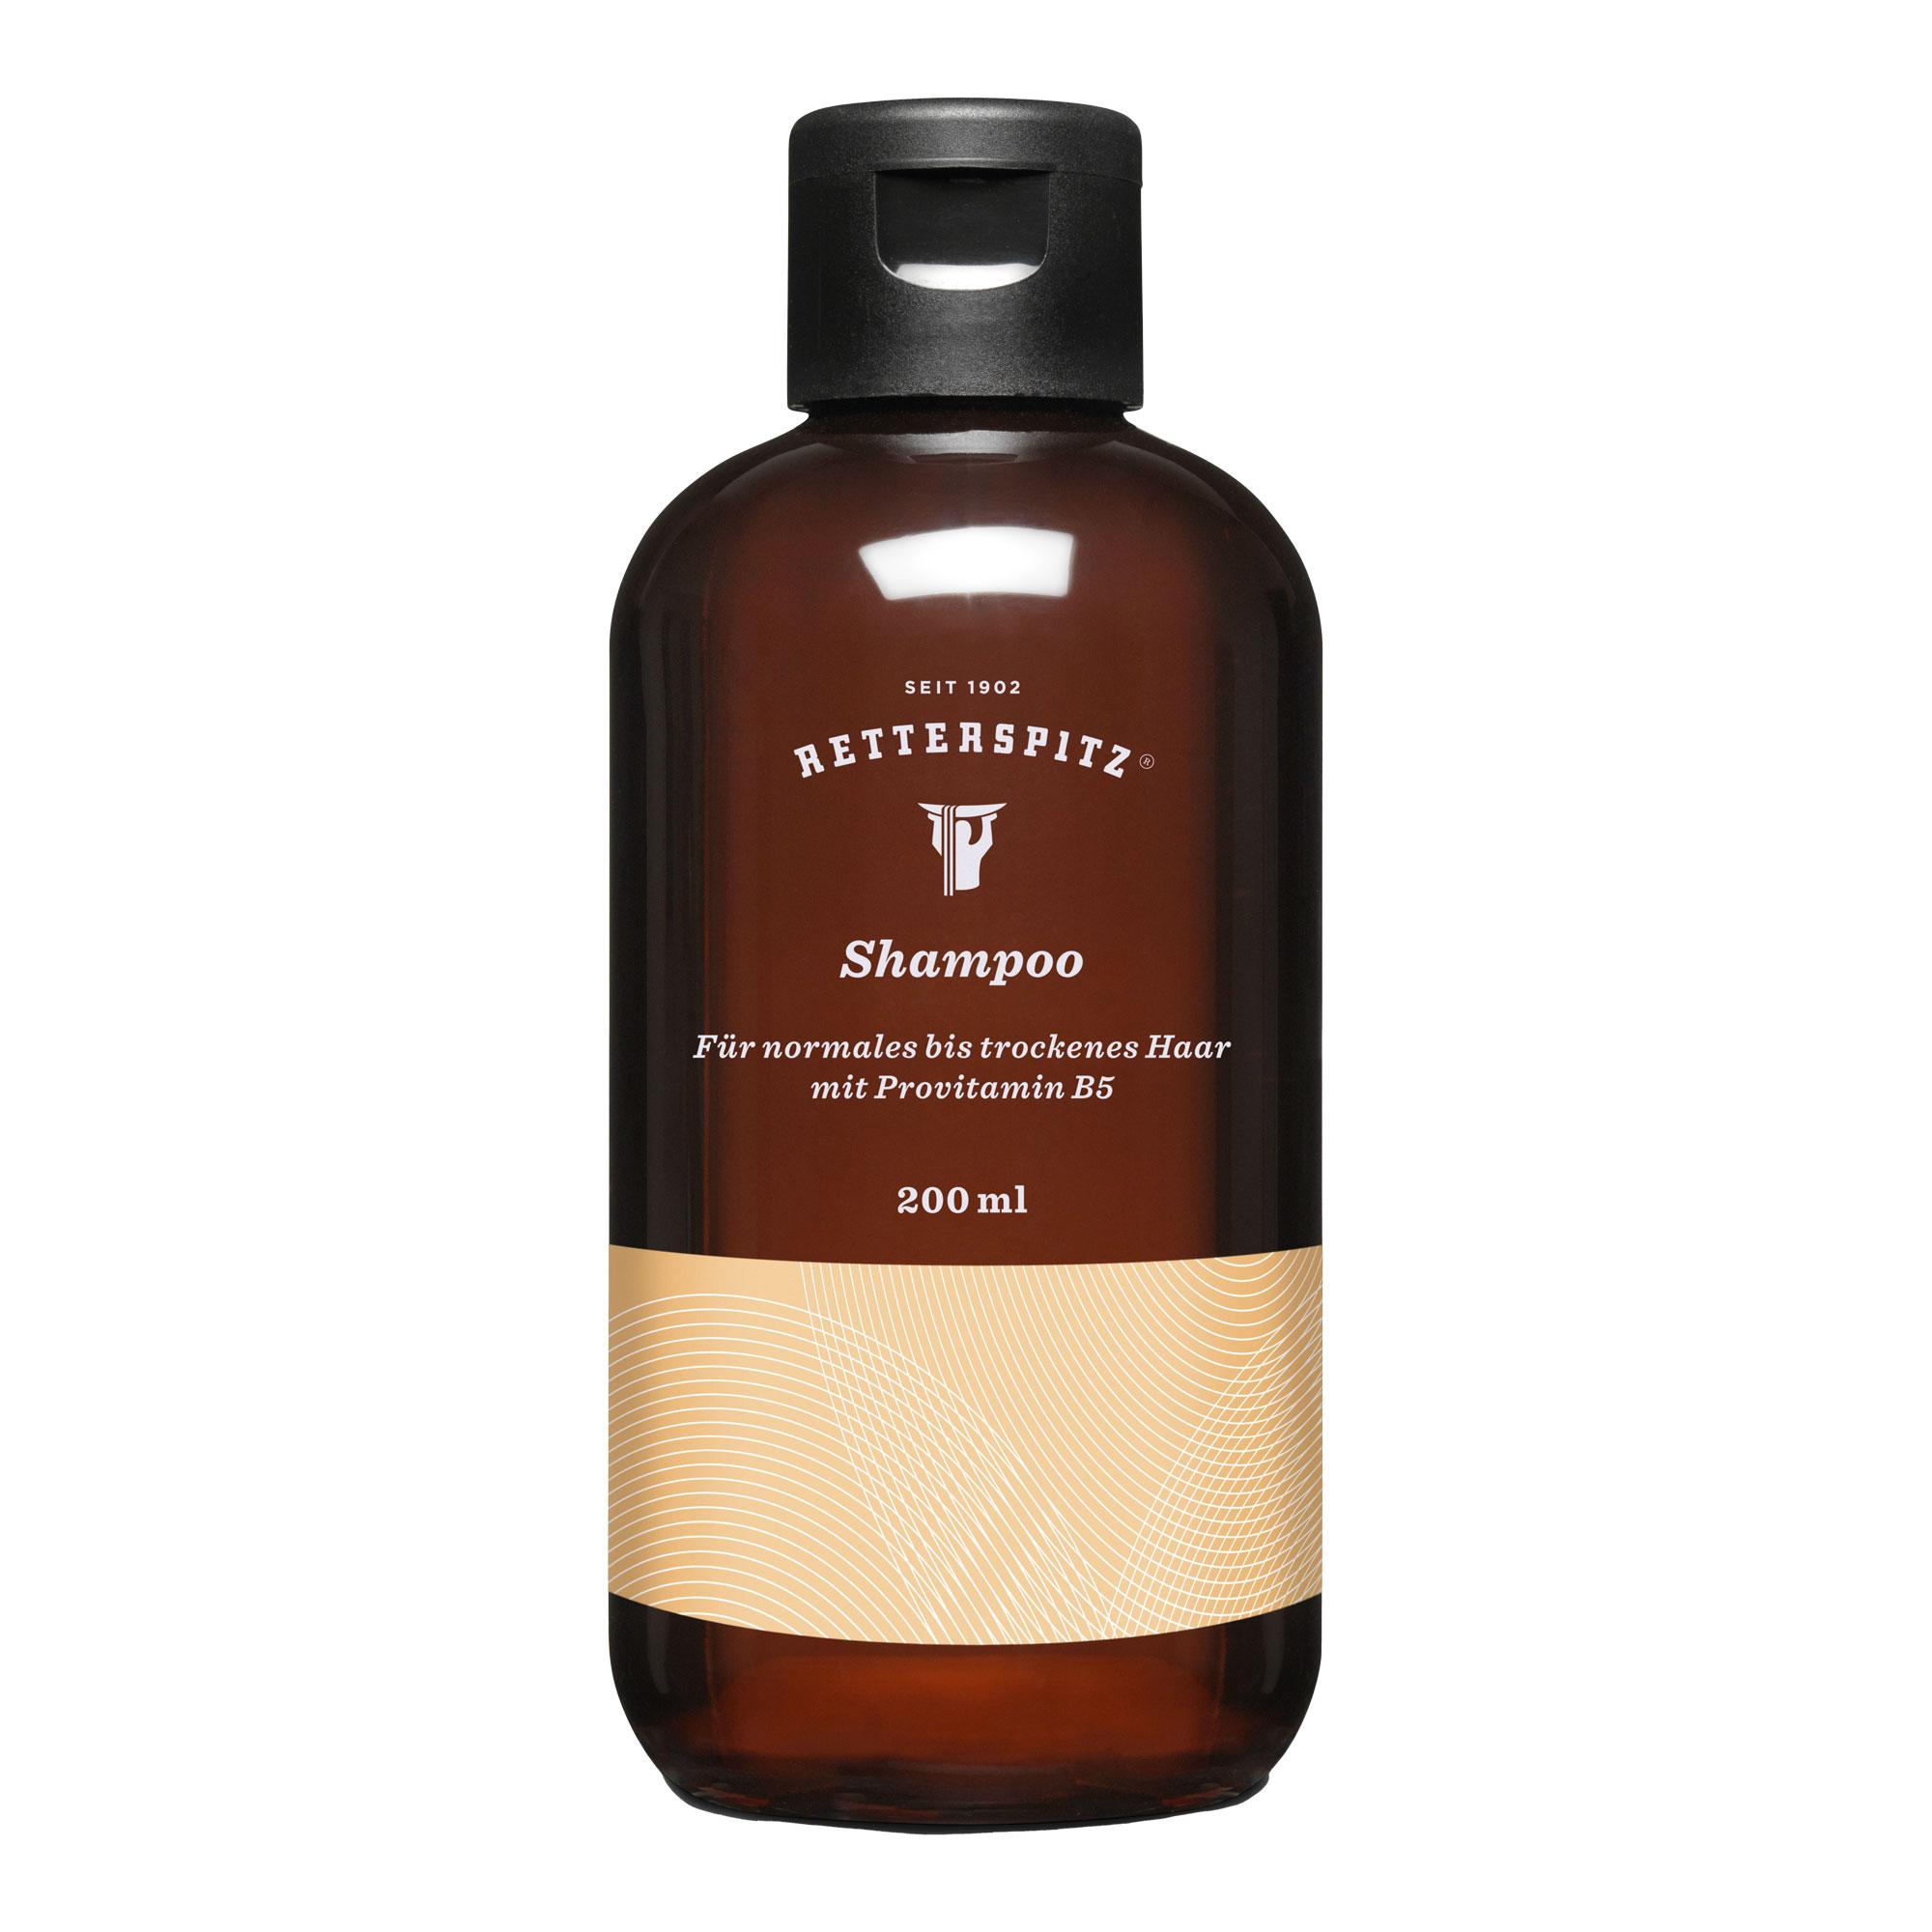 Retterspitz Shampoo